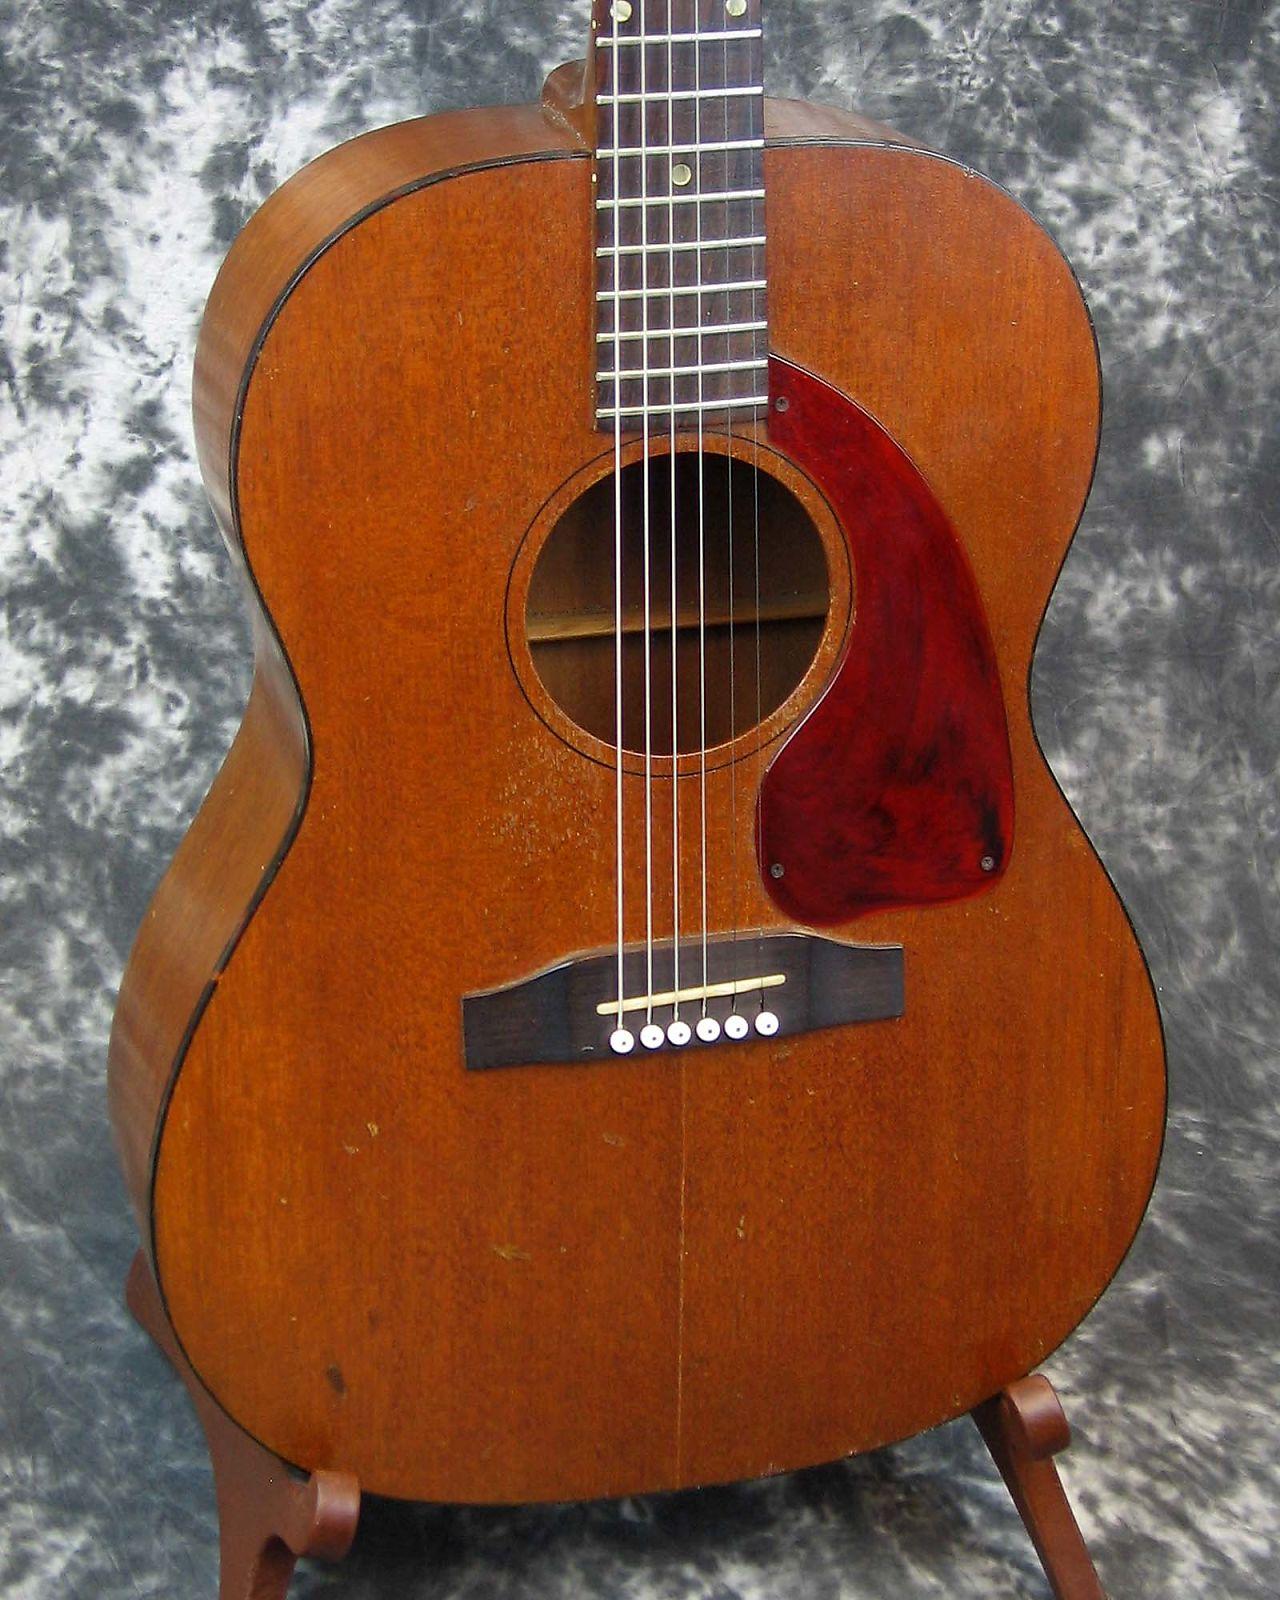 Vintage 1964 model Gibson LG-0 acoustic guitar